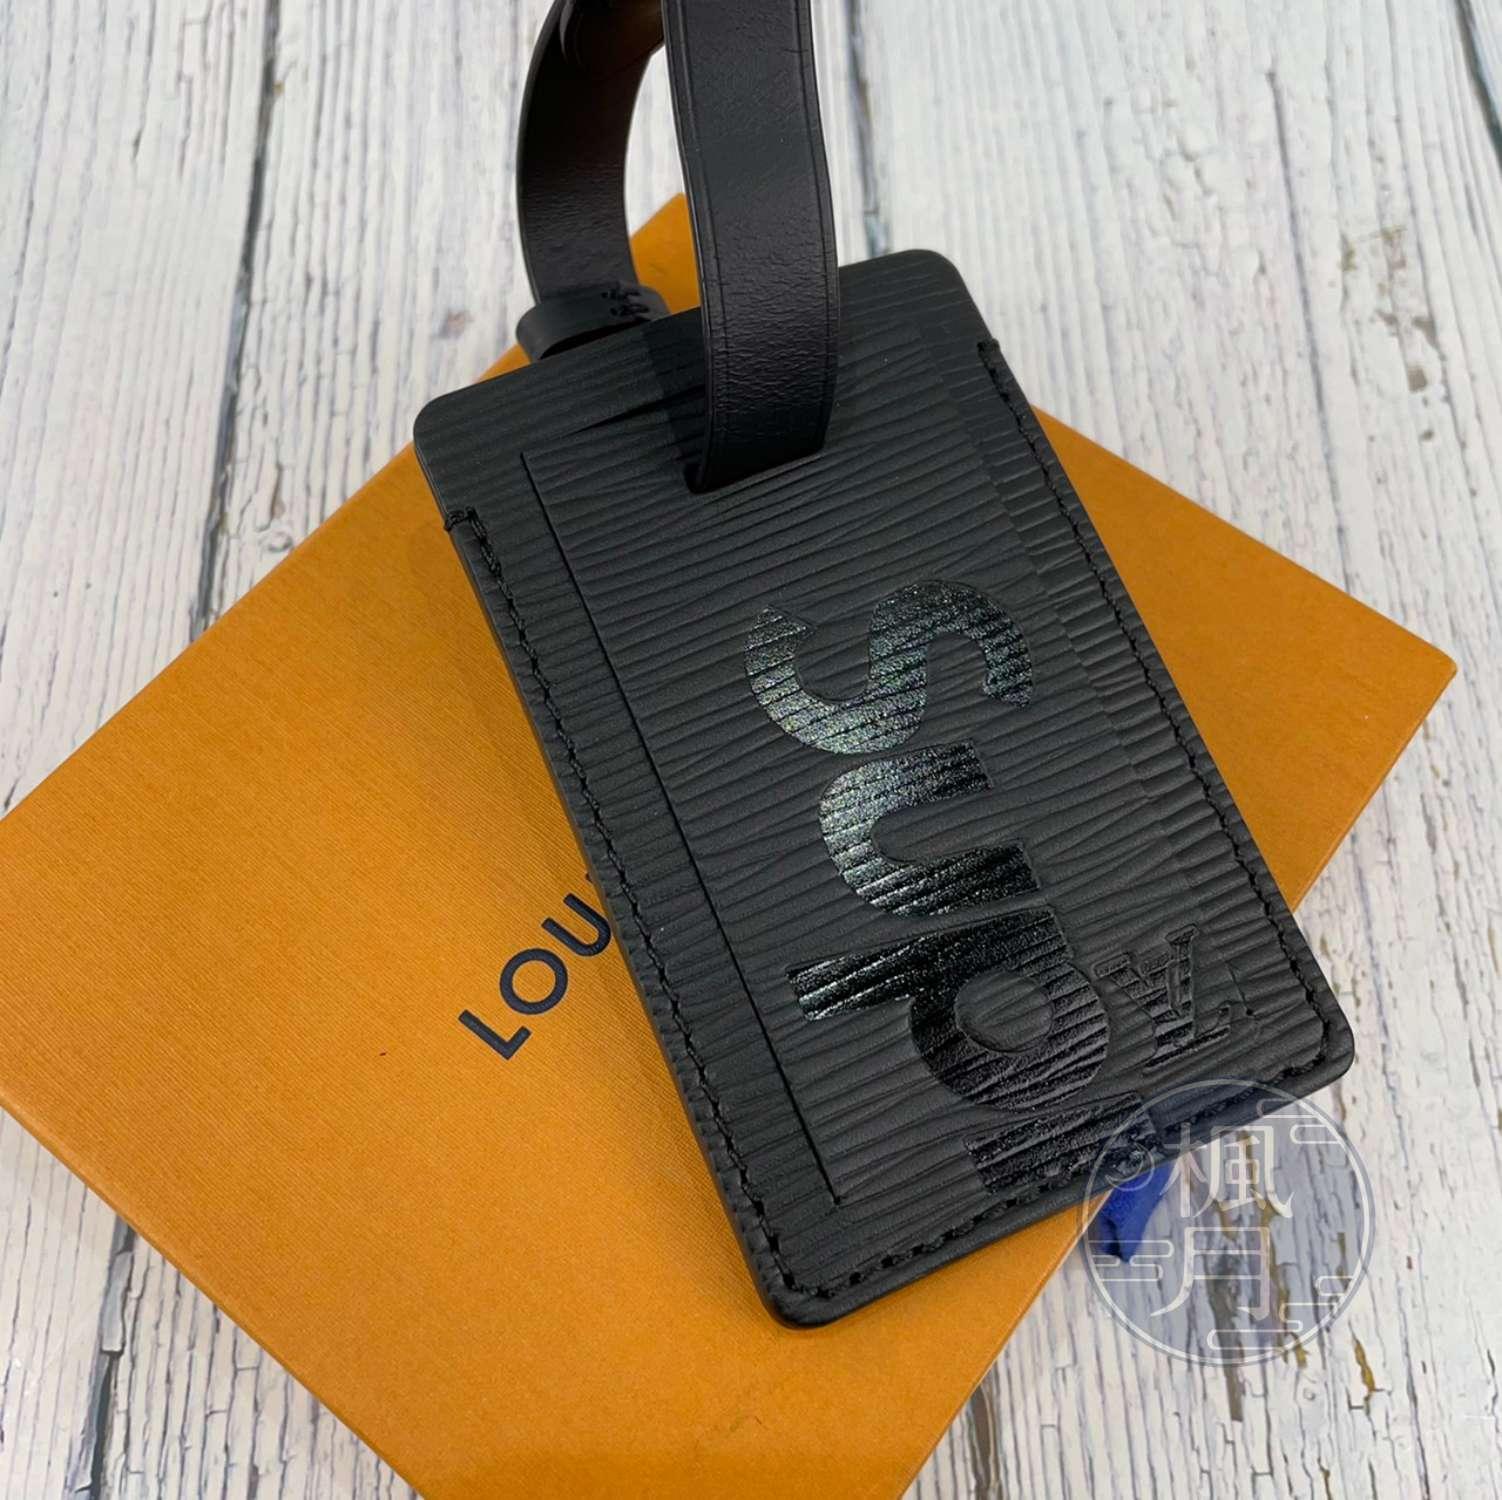 BRAND楓月 LOUIS VUITTON 路易威登 LV M67726 黑吊牌 SUPREME聯名 行李吊牌 名片放置